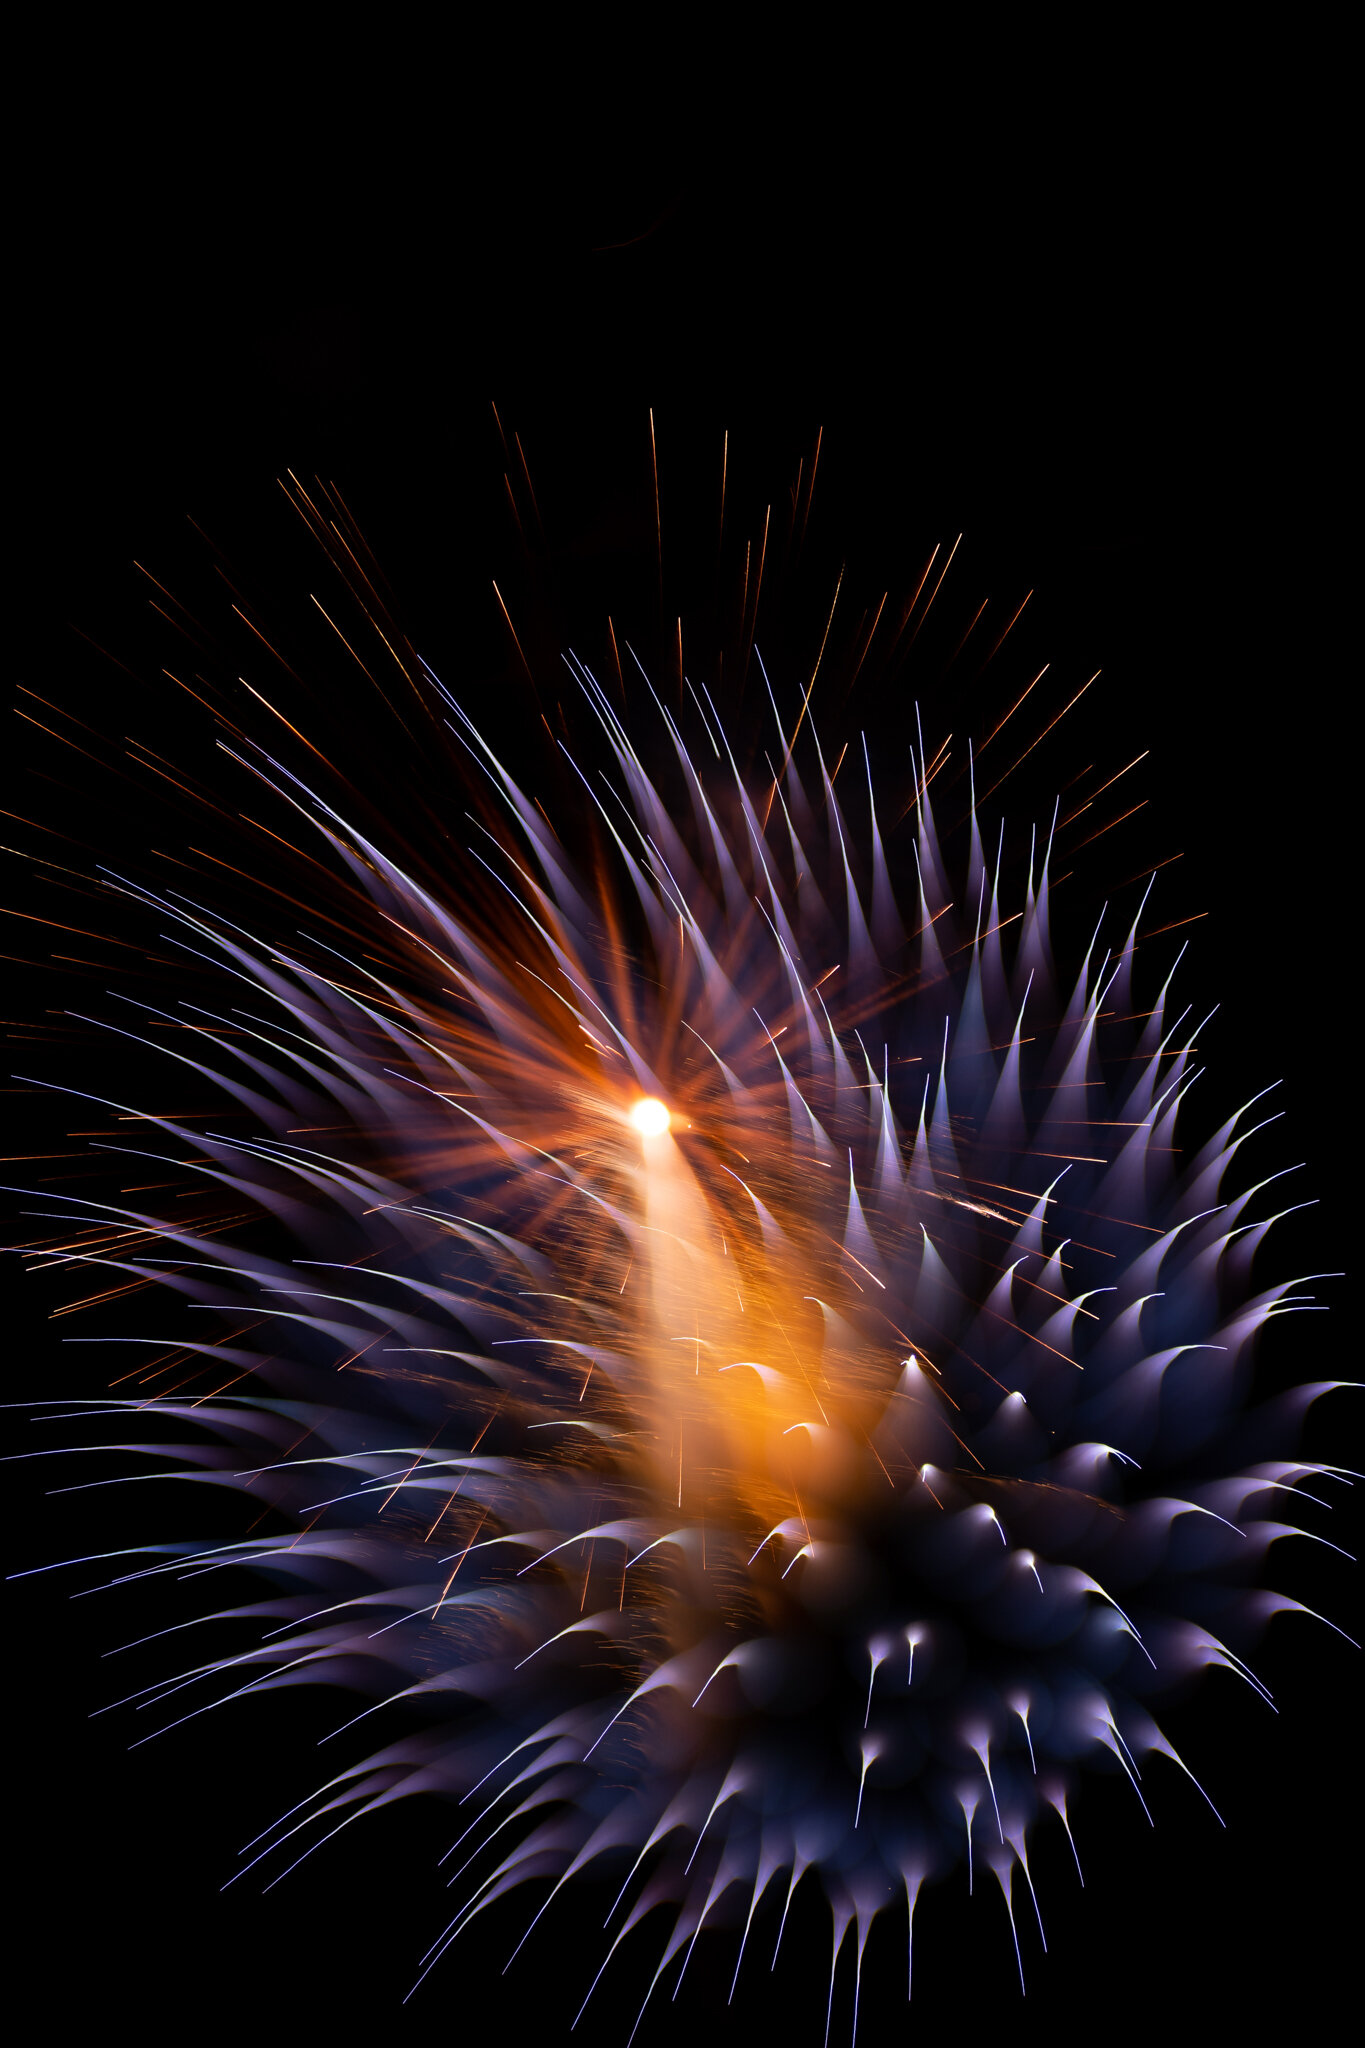 focuspulledfireworks-14.jpg